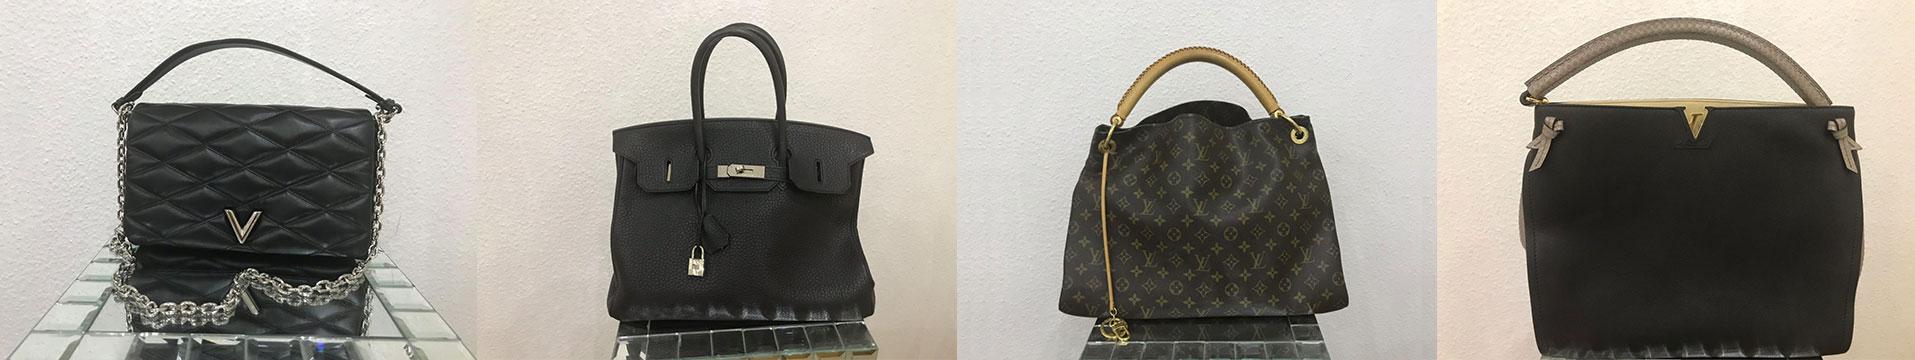 Edele Damenhandtaschen